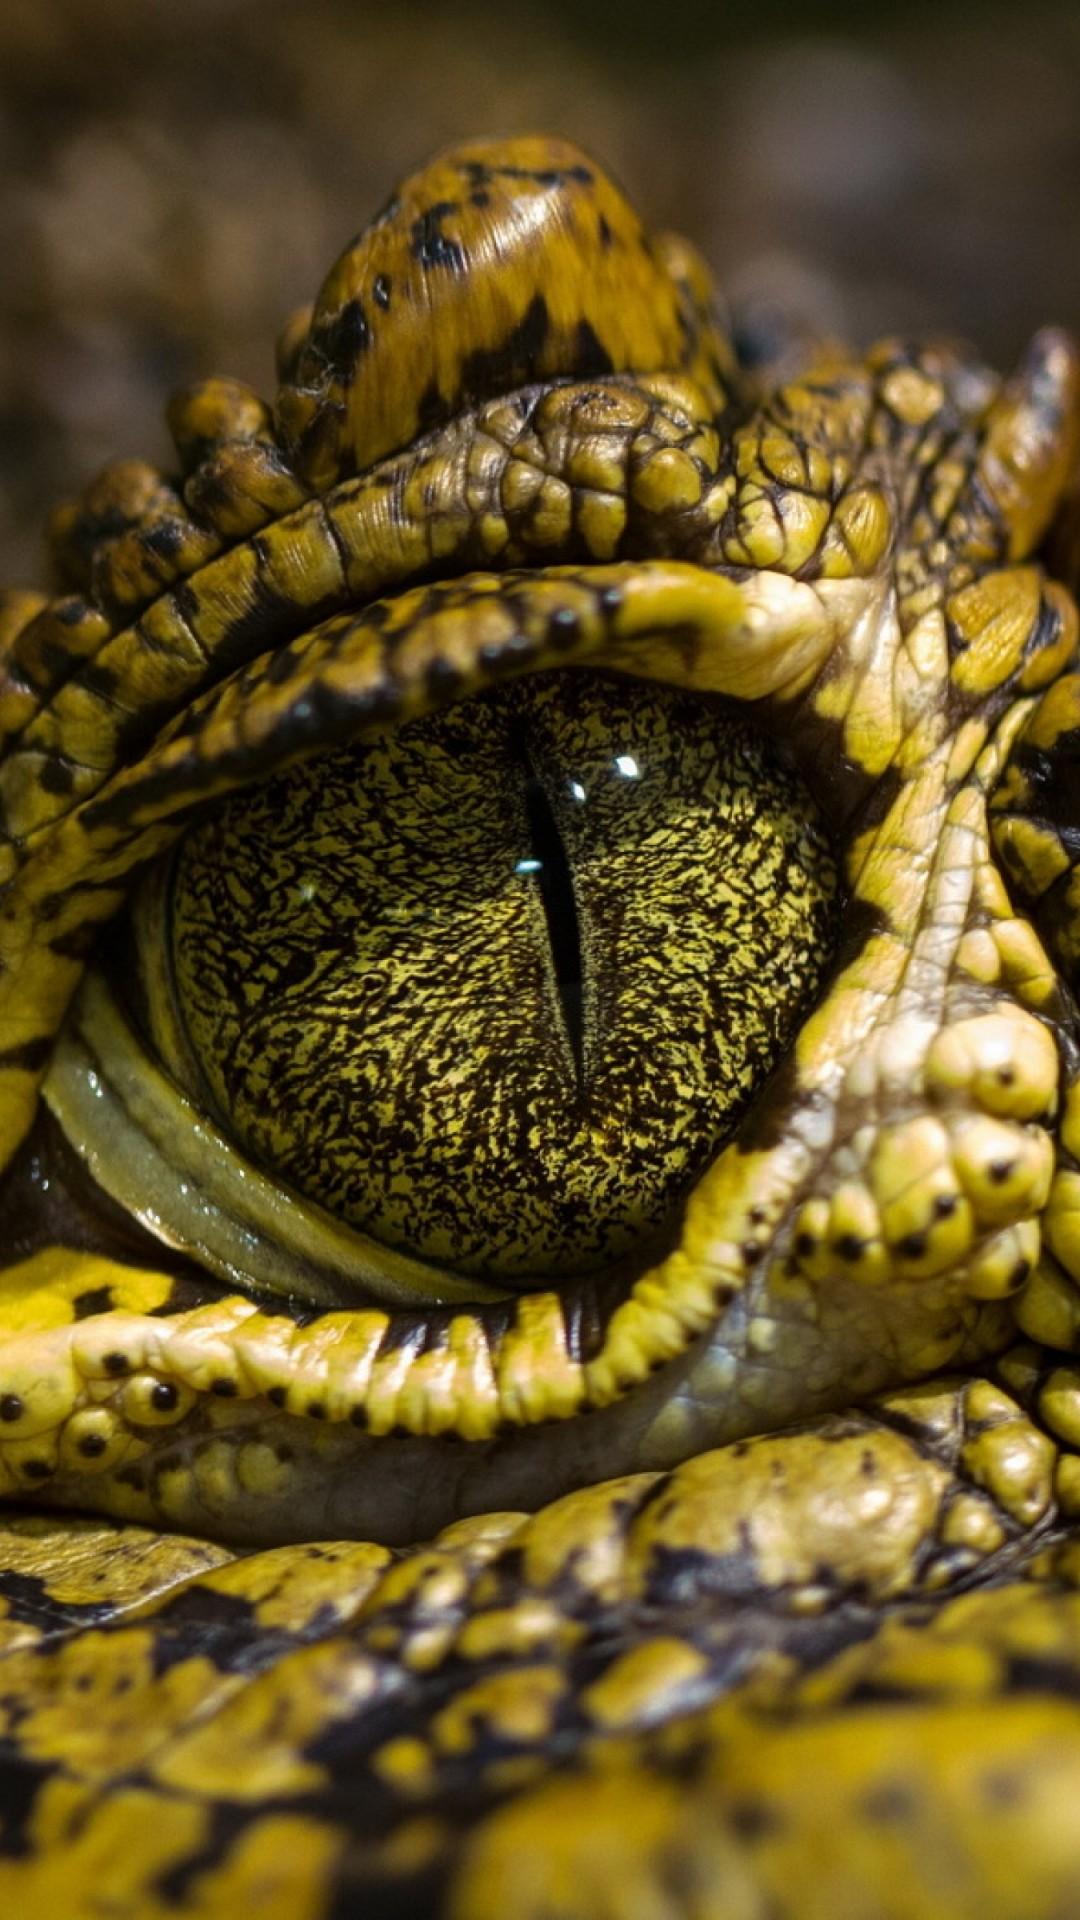 Wallpaper eye crocodile, wild eyes, reptilies, Animals #10124